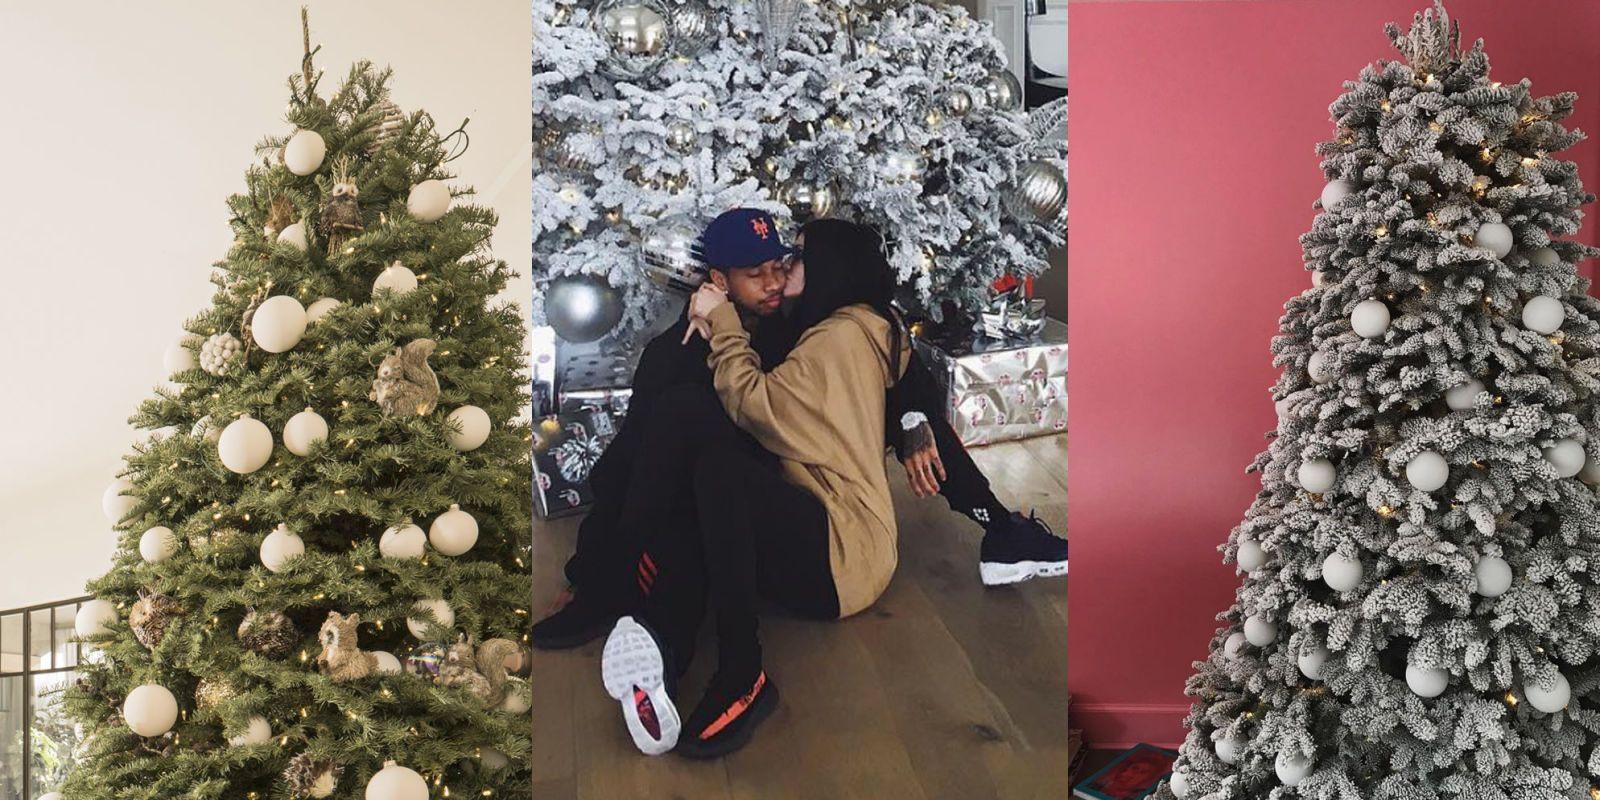 Kylie Jenner, Kendall Jenner and Kim Kardashian's Christmas Trees ...